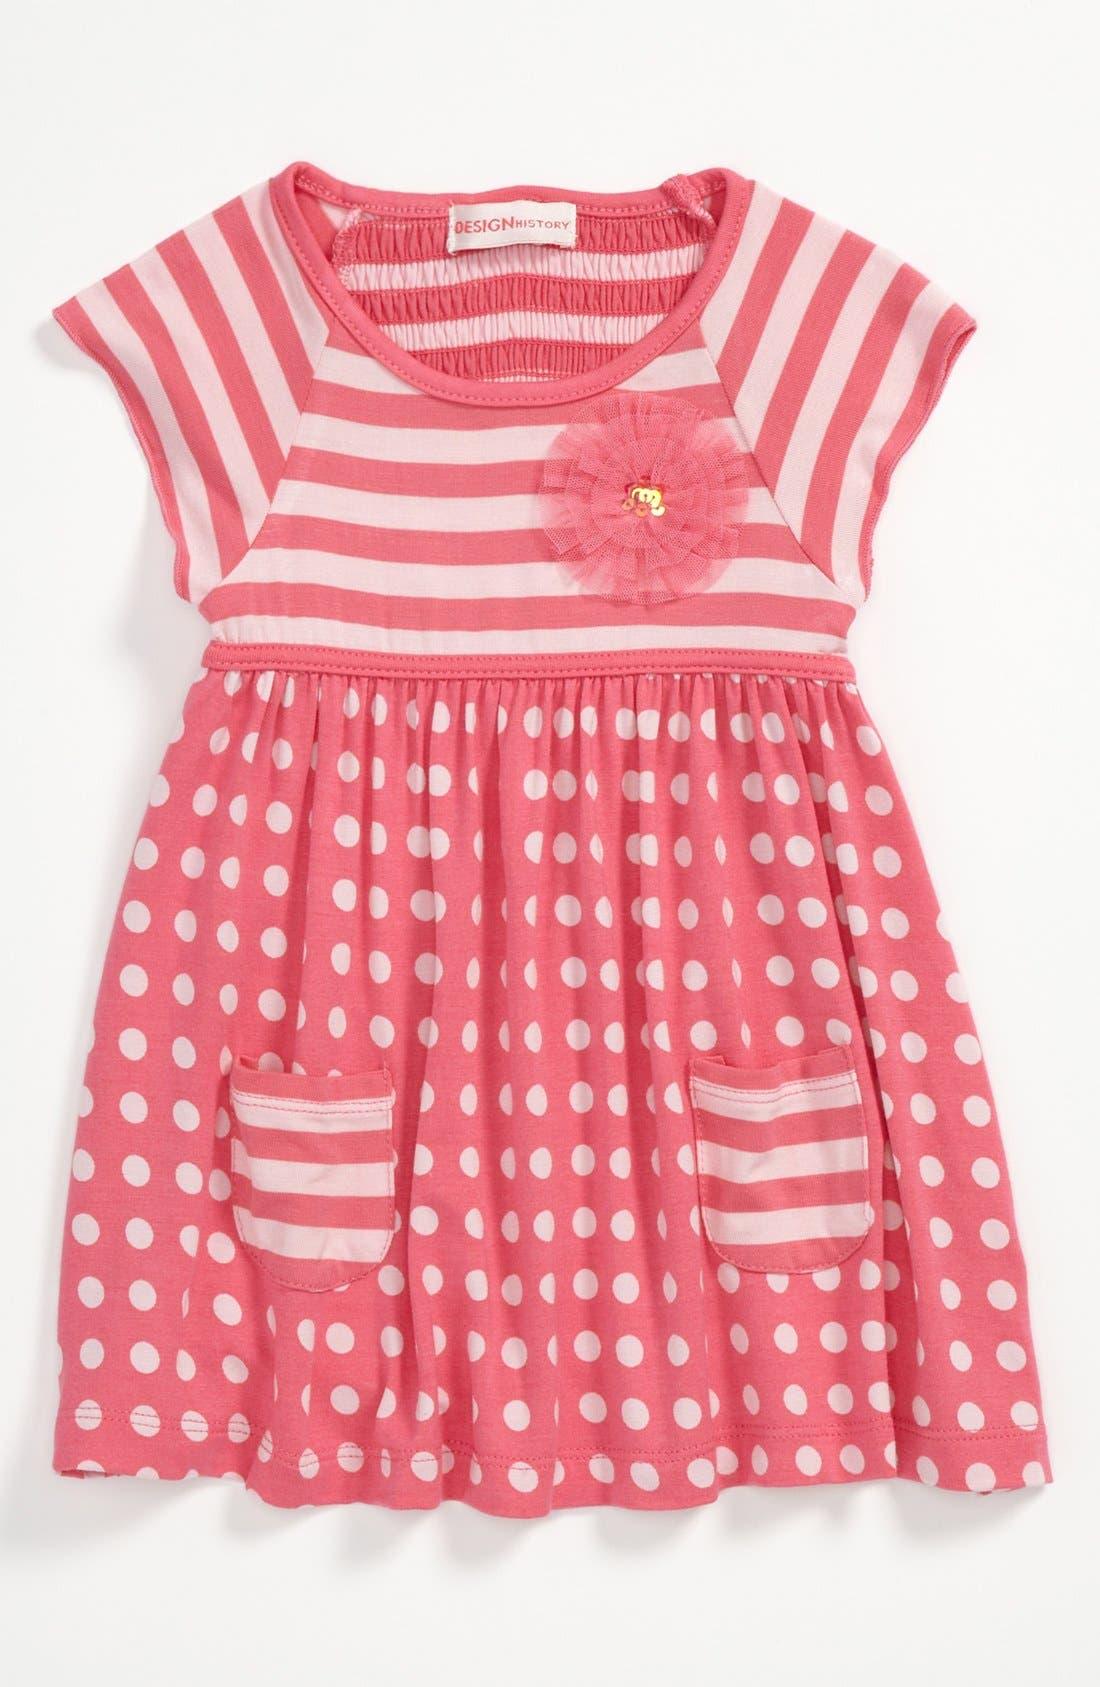 Alternate Image 1 Selected - Design History Dress (Baby)